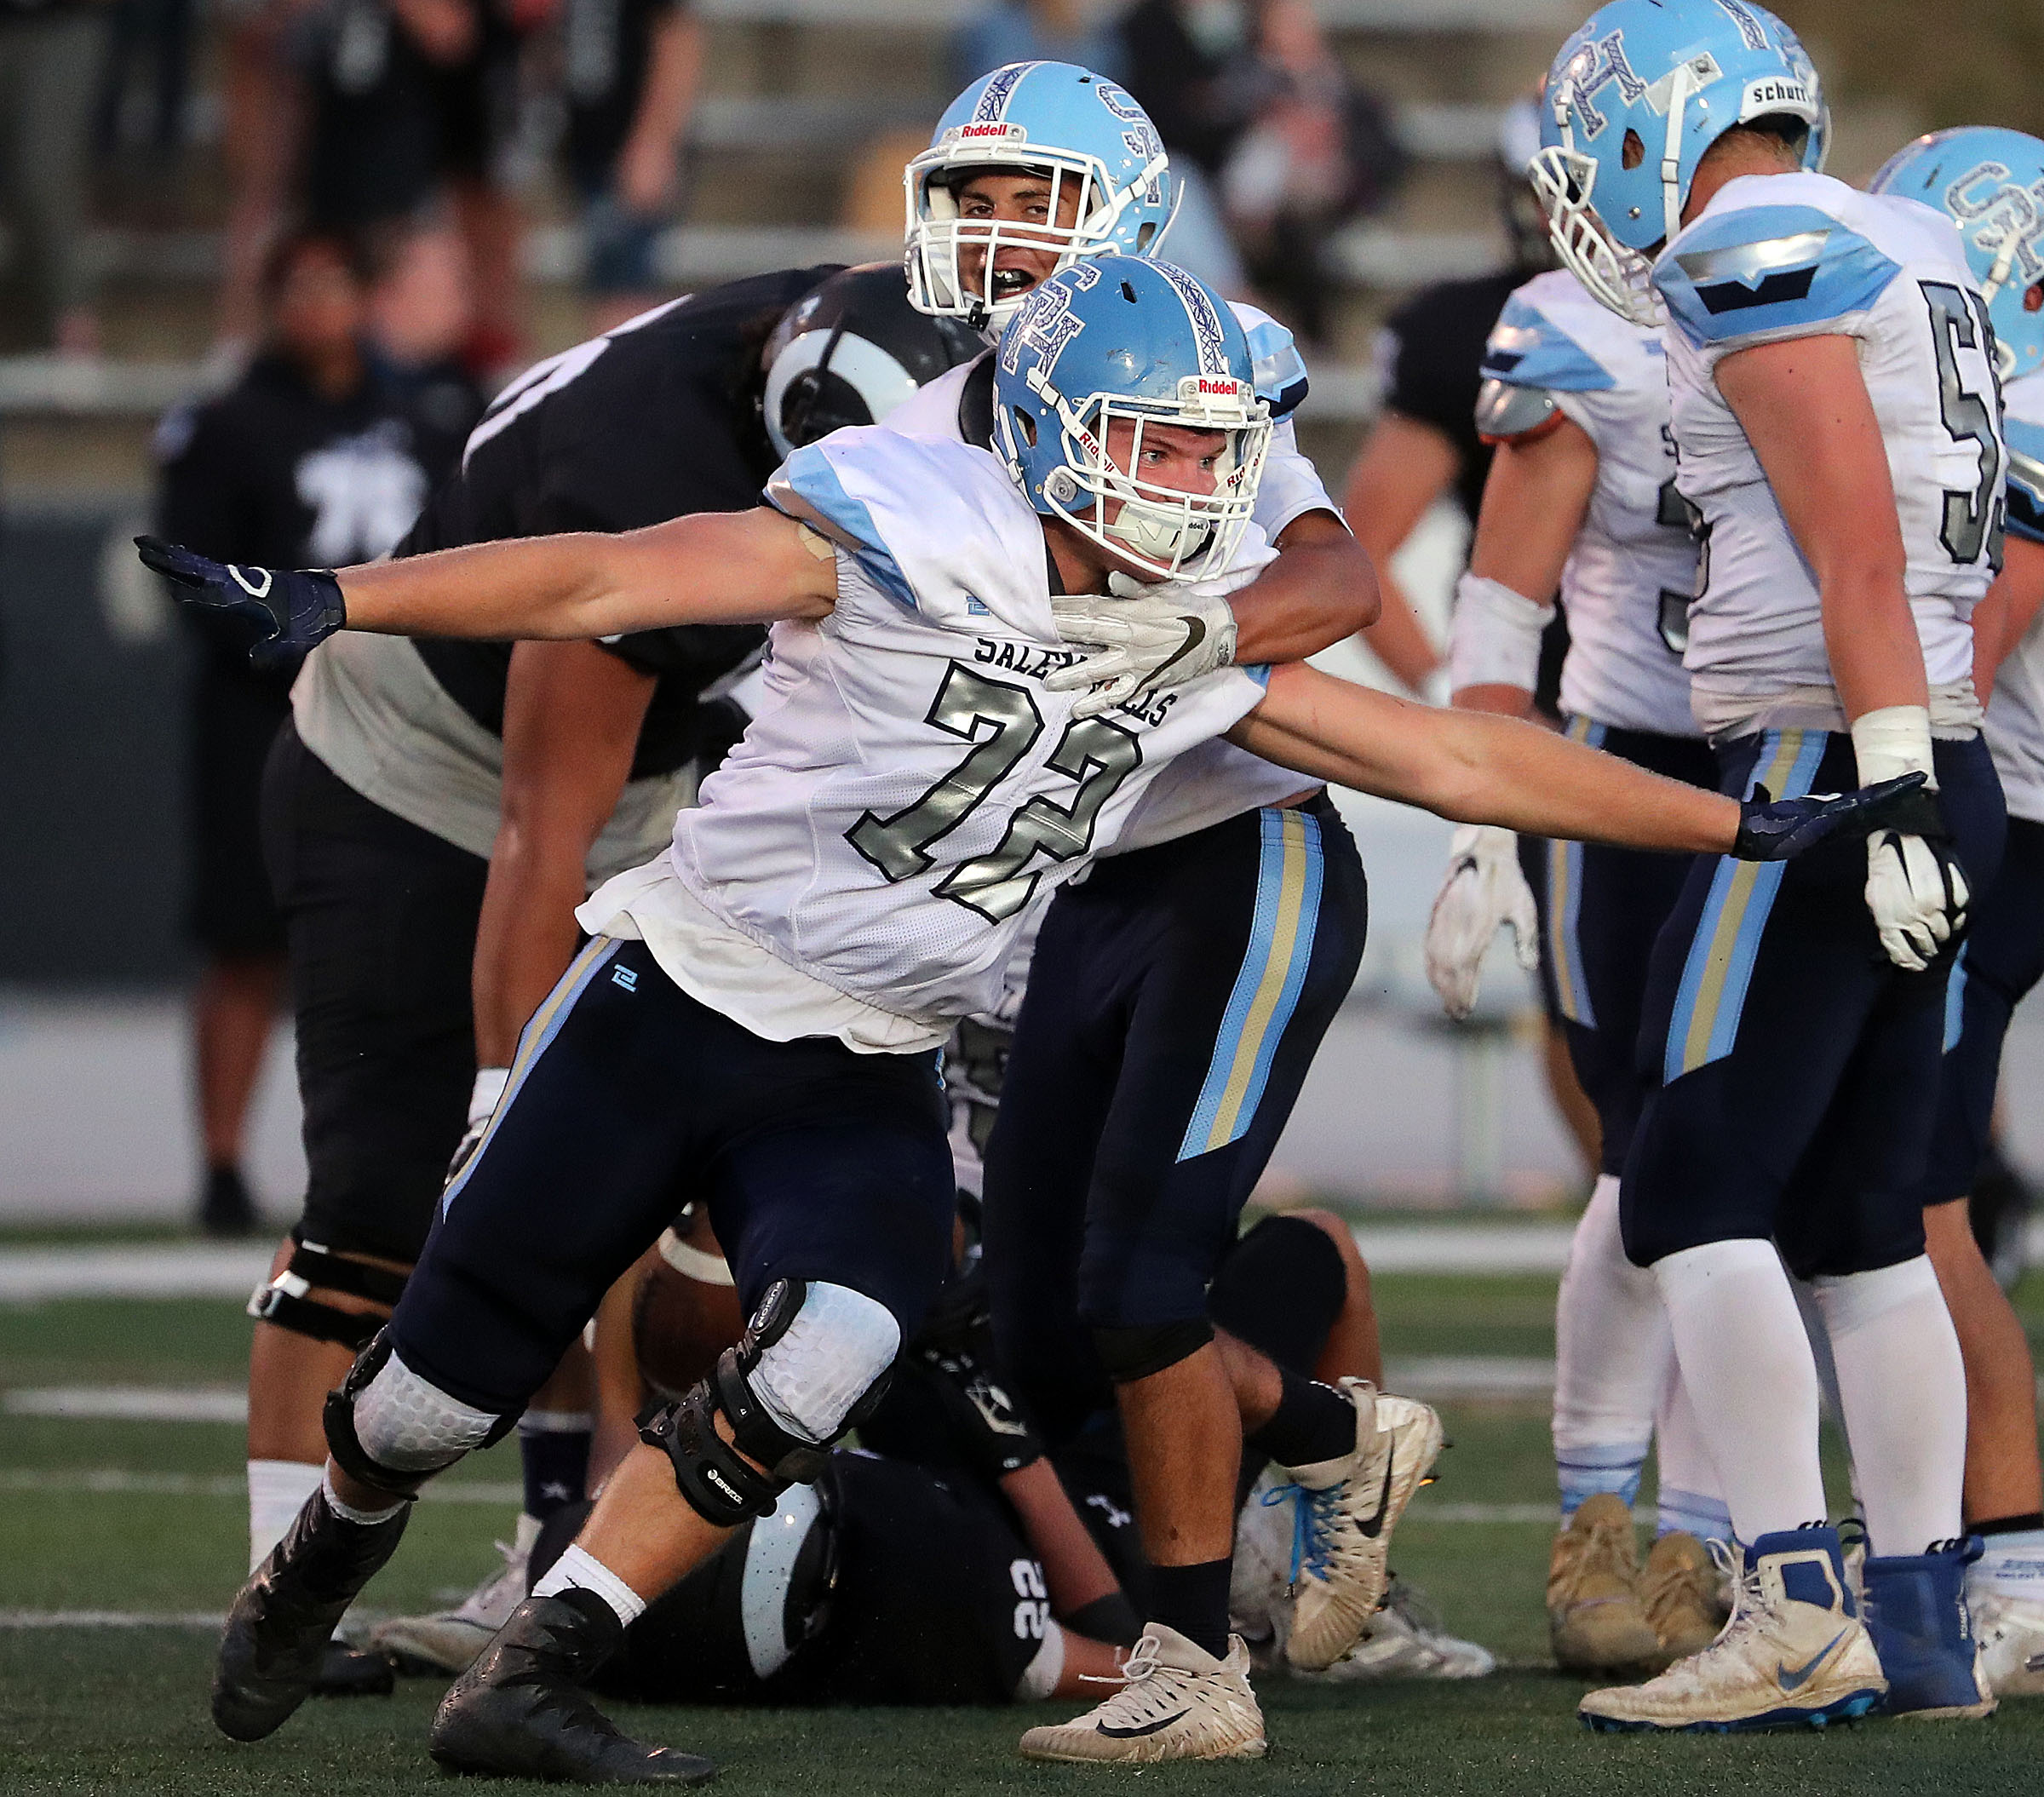 Derek Burton of Salem Hills celebrates making a stop against Highland during a high school football game played in Salt Lake City on Friday, Sept. 13, 2019.